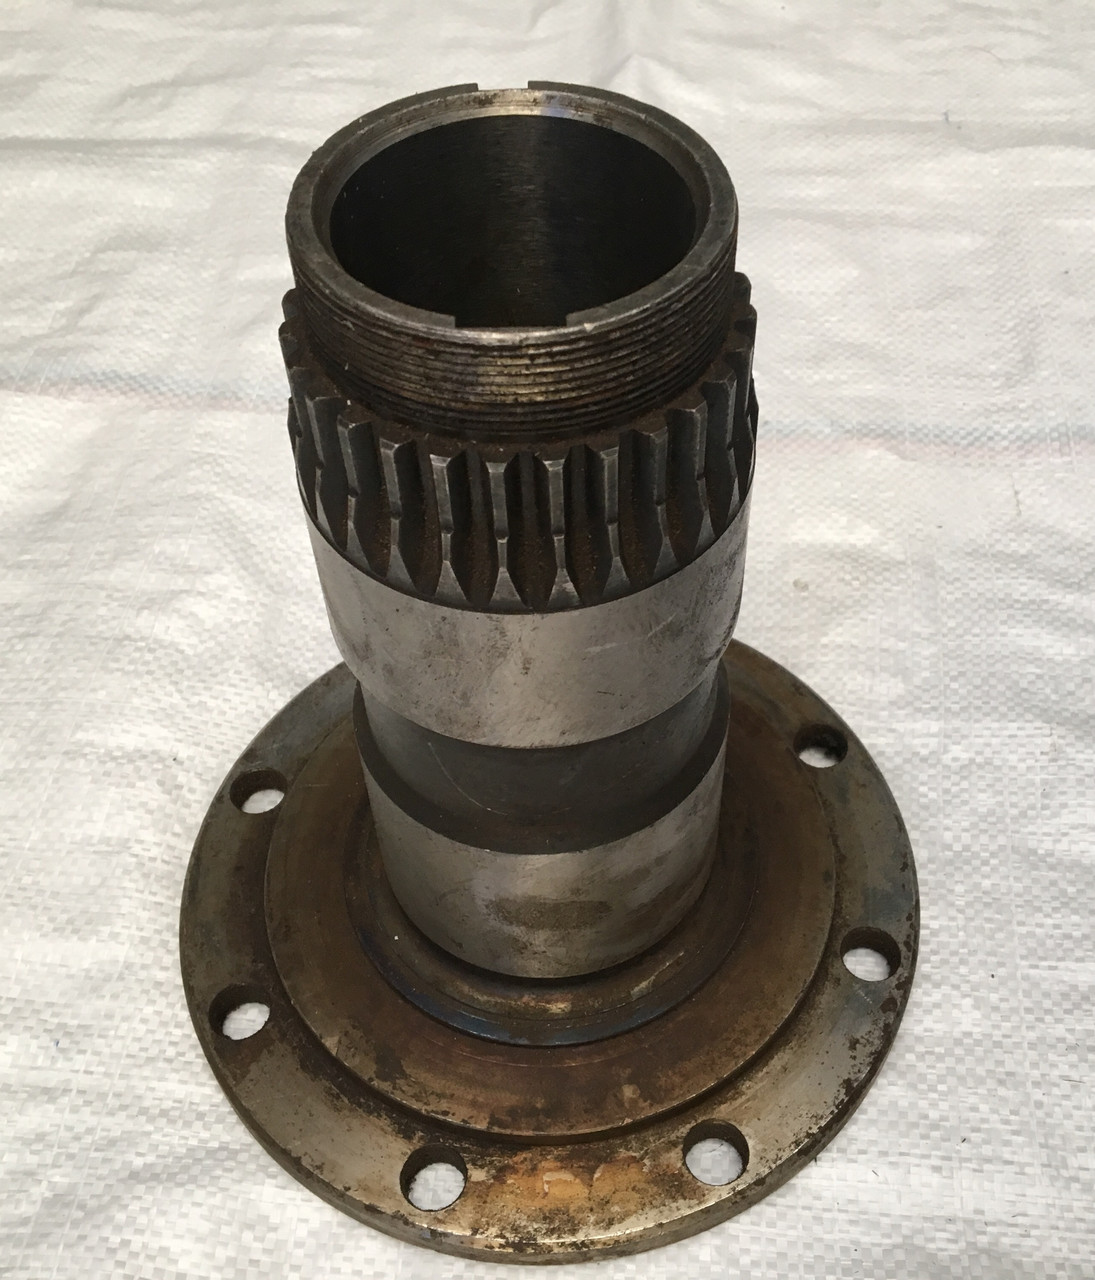 Ступица диска шкива вариатора барабана шлицевая  РСМ-10.01.18.608Б ДОН-1500Б